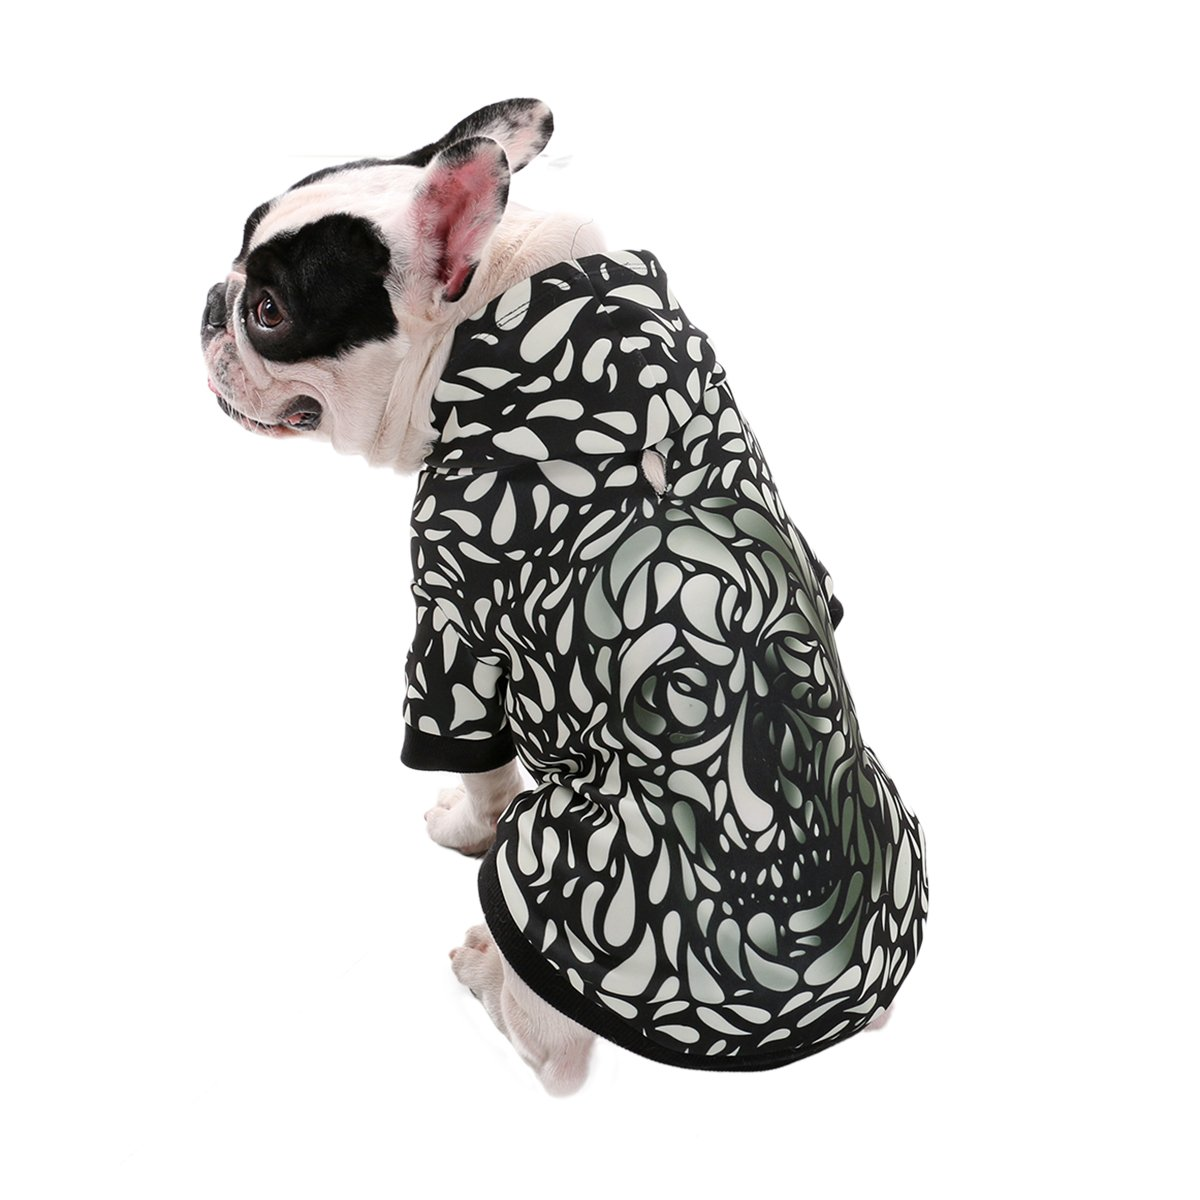 PAWZ Road Realistic 3d Digital Print Dog Hoodie, Pet Pullover Hooded Sweatshirt Hoodies for Small Medium Large Dogs